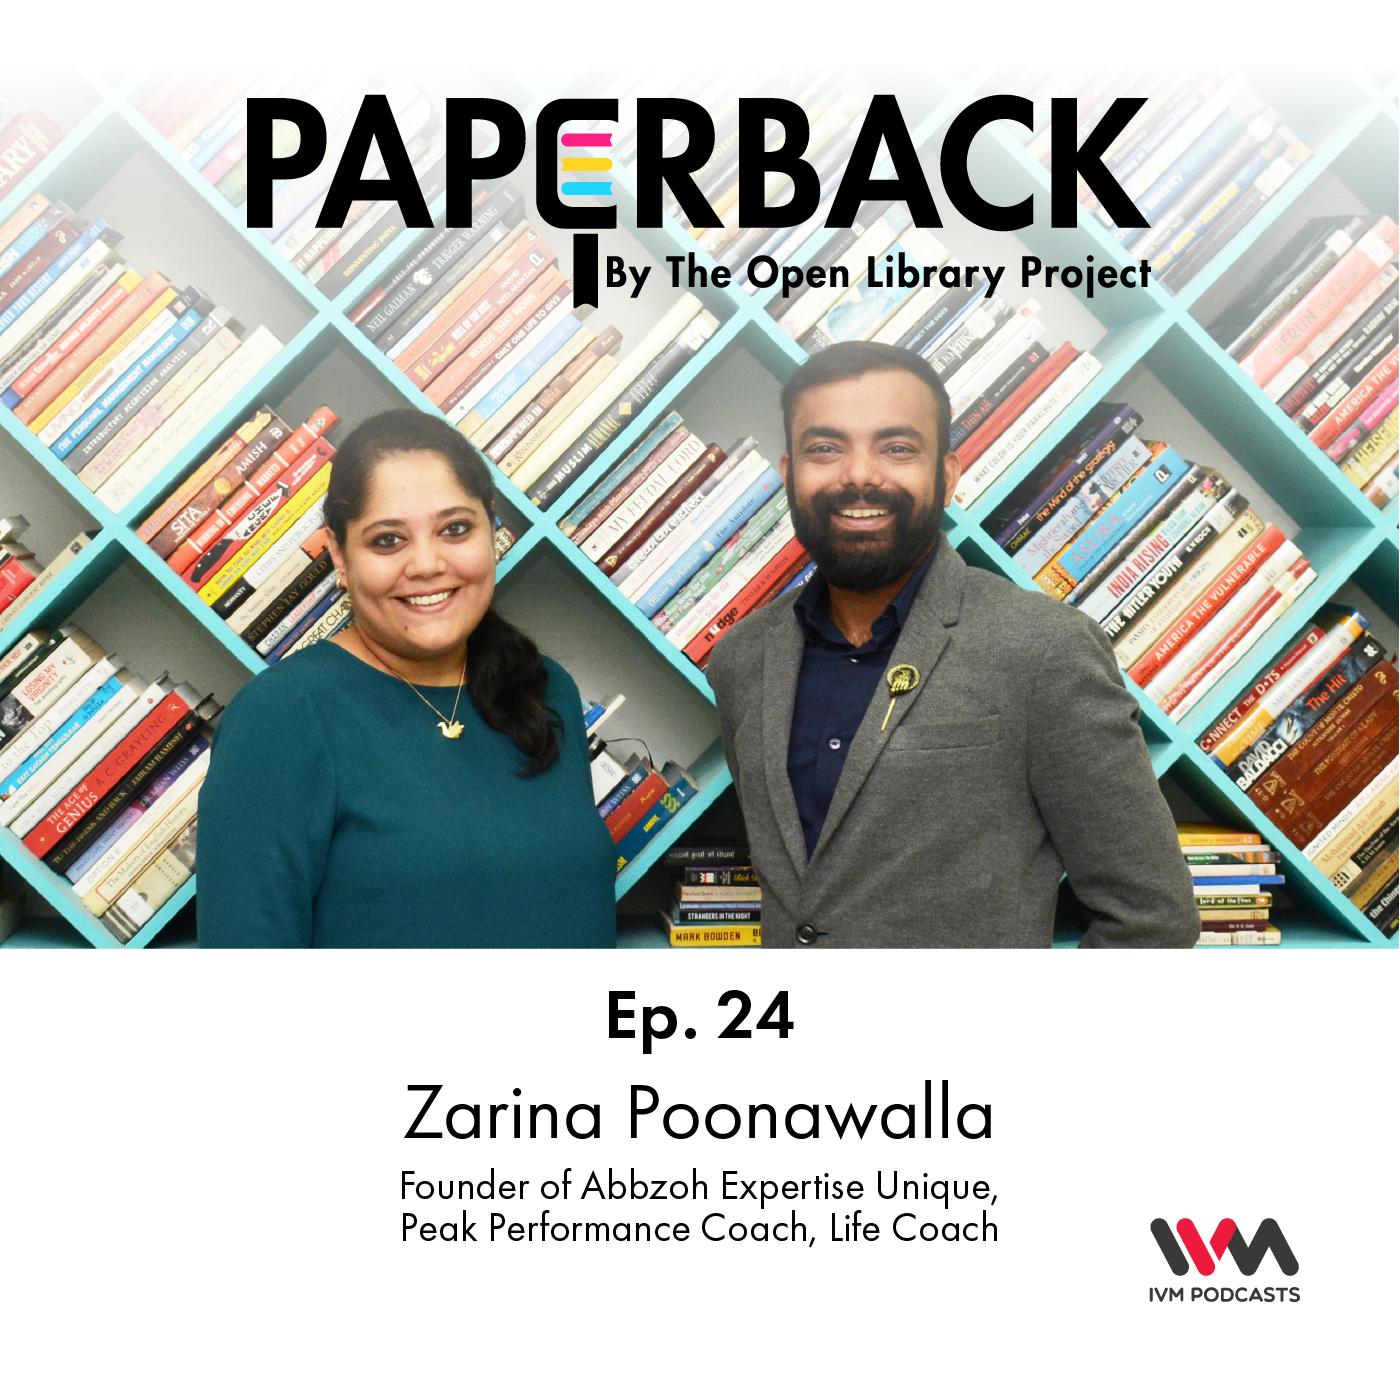 Ep. 24: Zarina Poonawalla